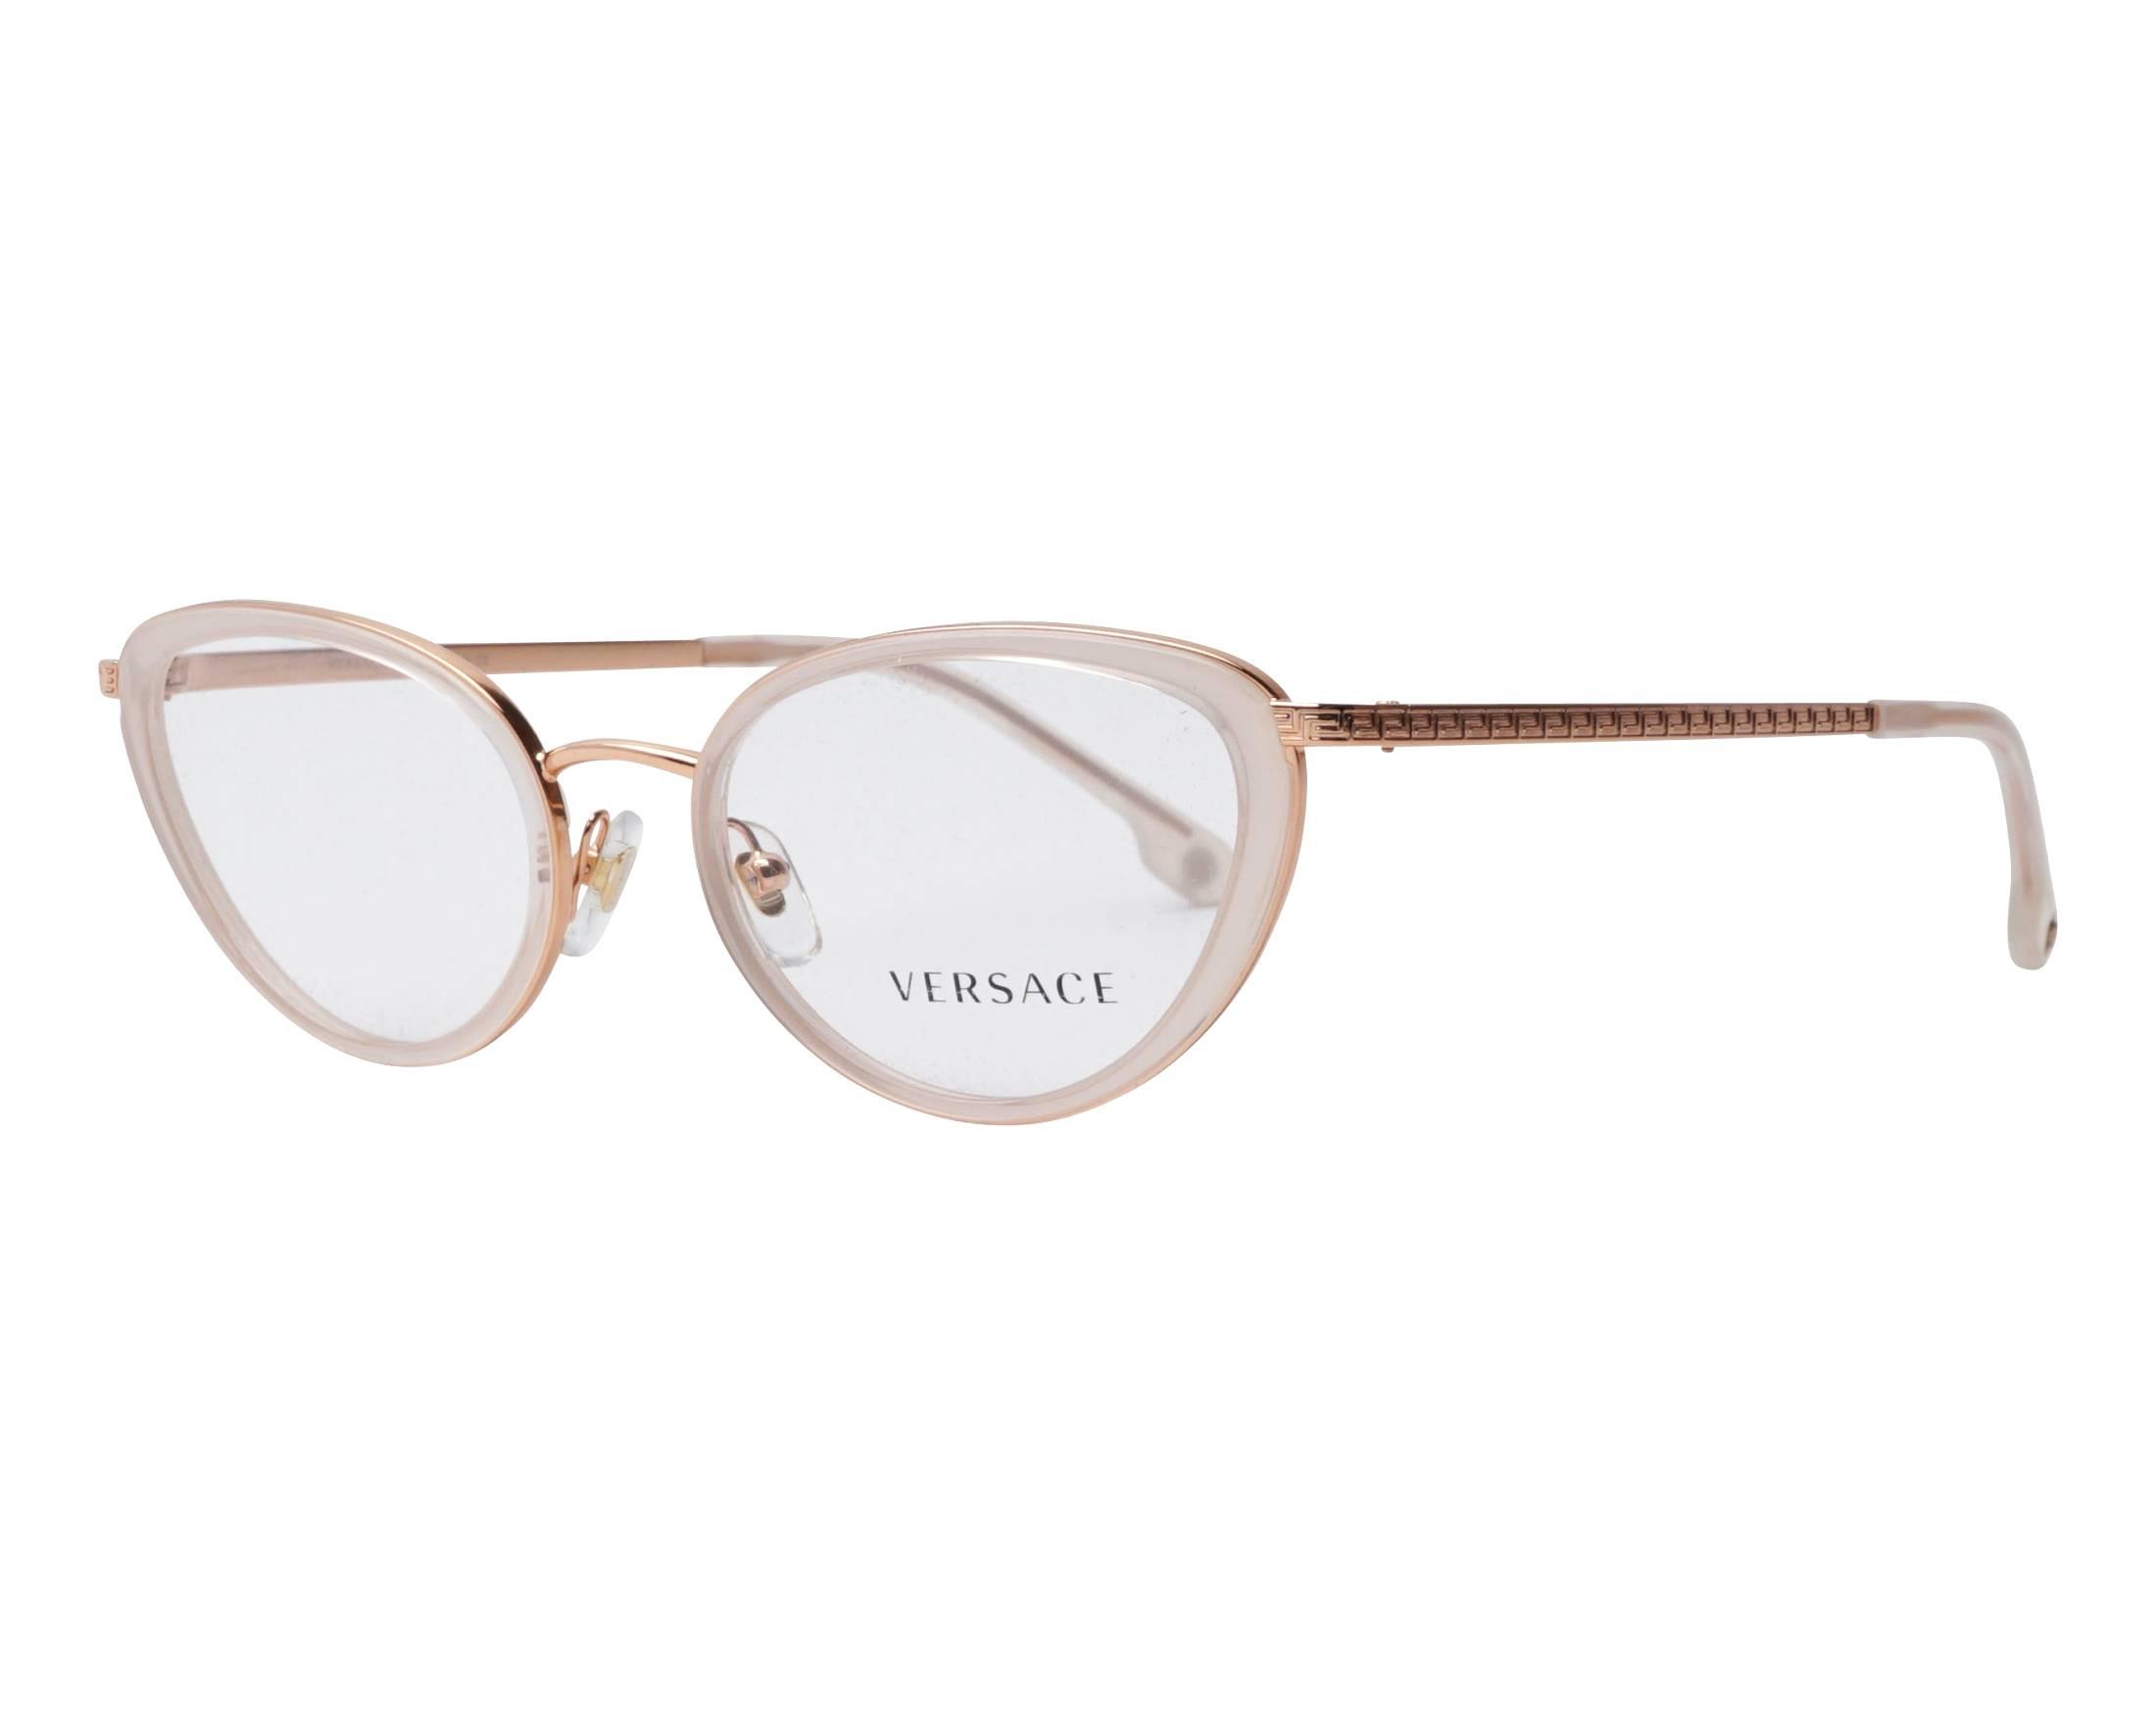 5ec384112b eyeglasses Versace VE-1258 1442 52-19 Gold Copper White profile view